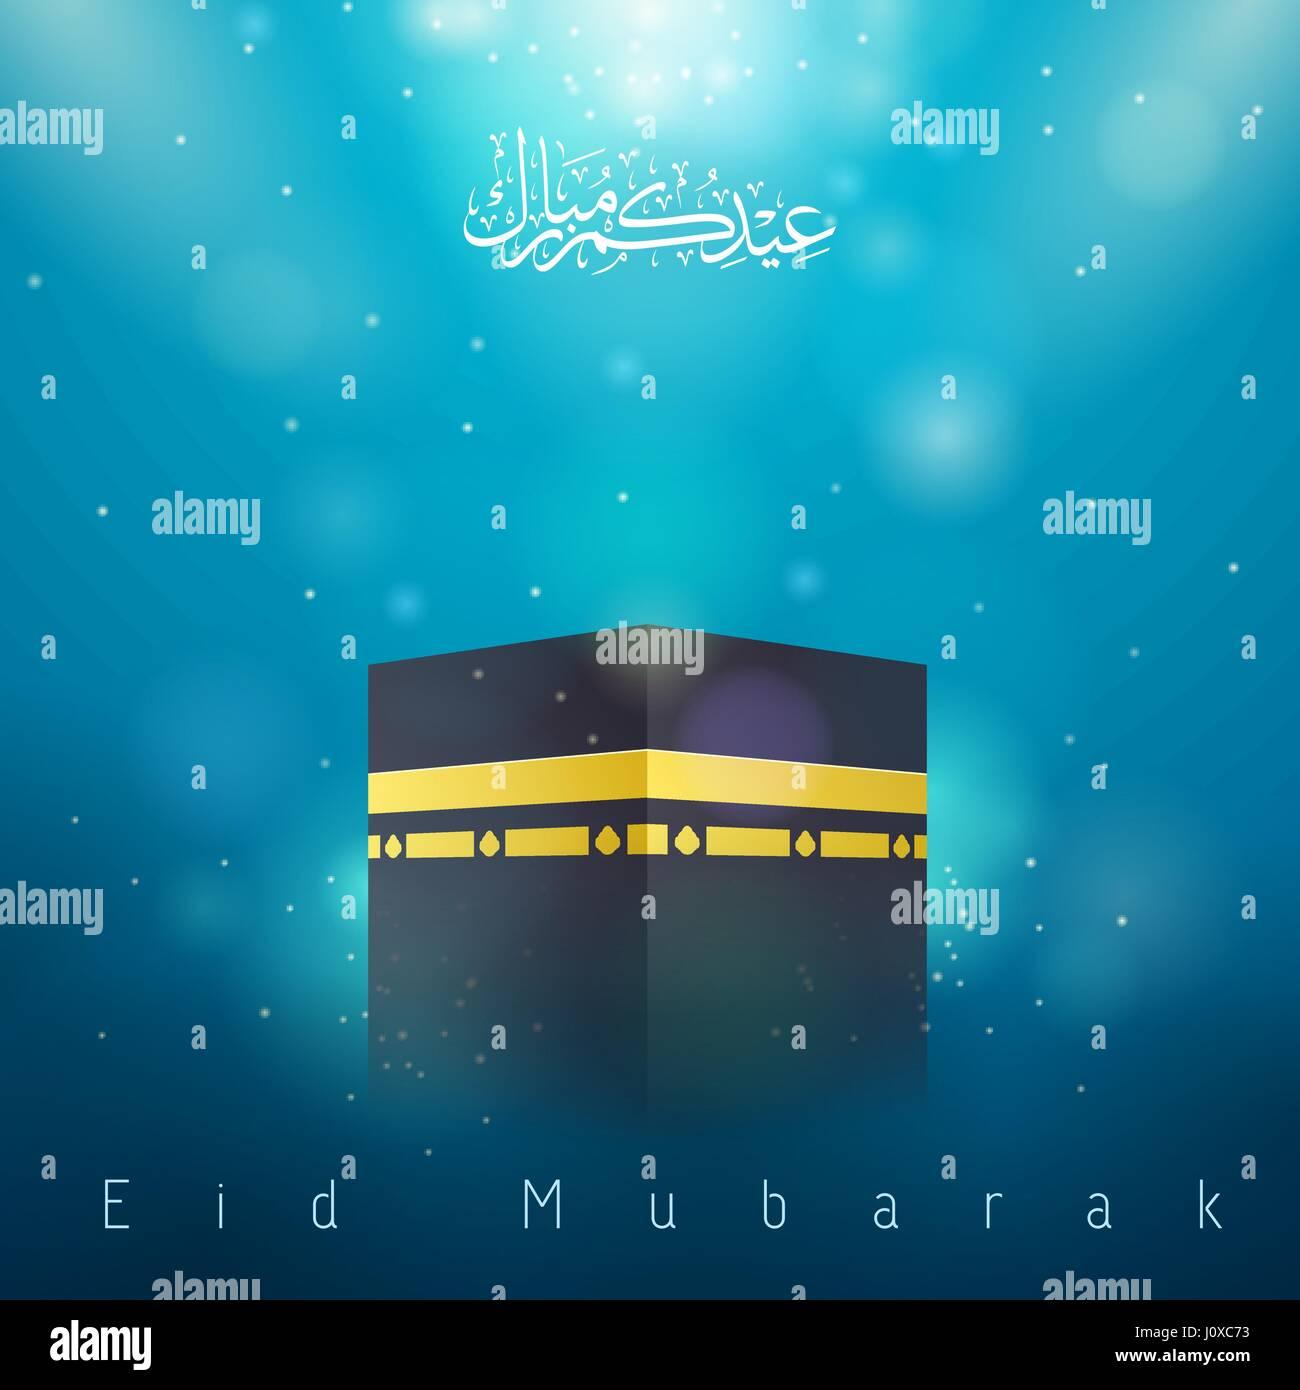 Eid Mubarak Kaaba Islamic Greeting Stock Vector Art Illustration